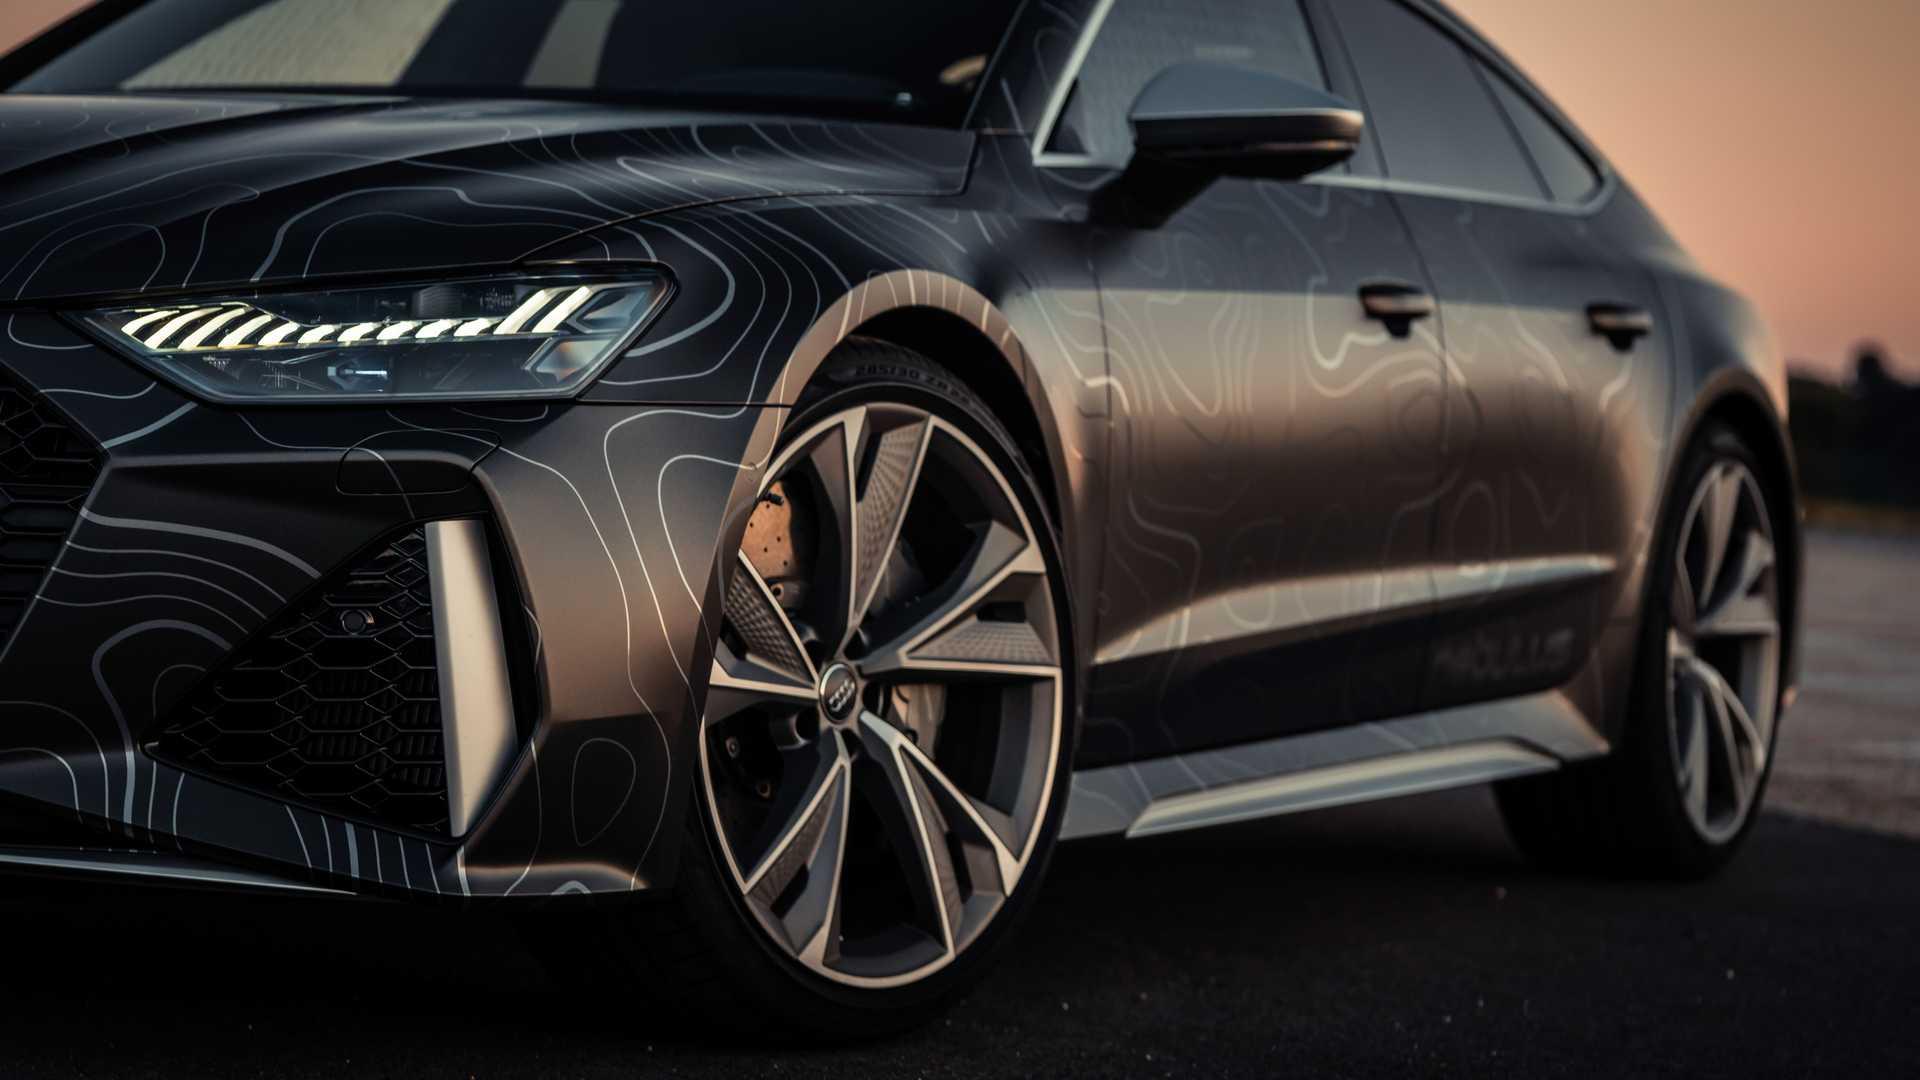 Audi-RS7-By-Black-Box-Richter-11